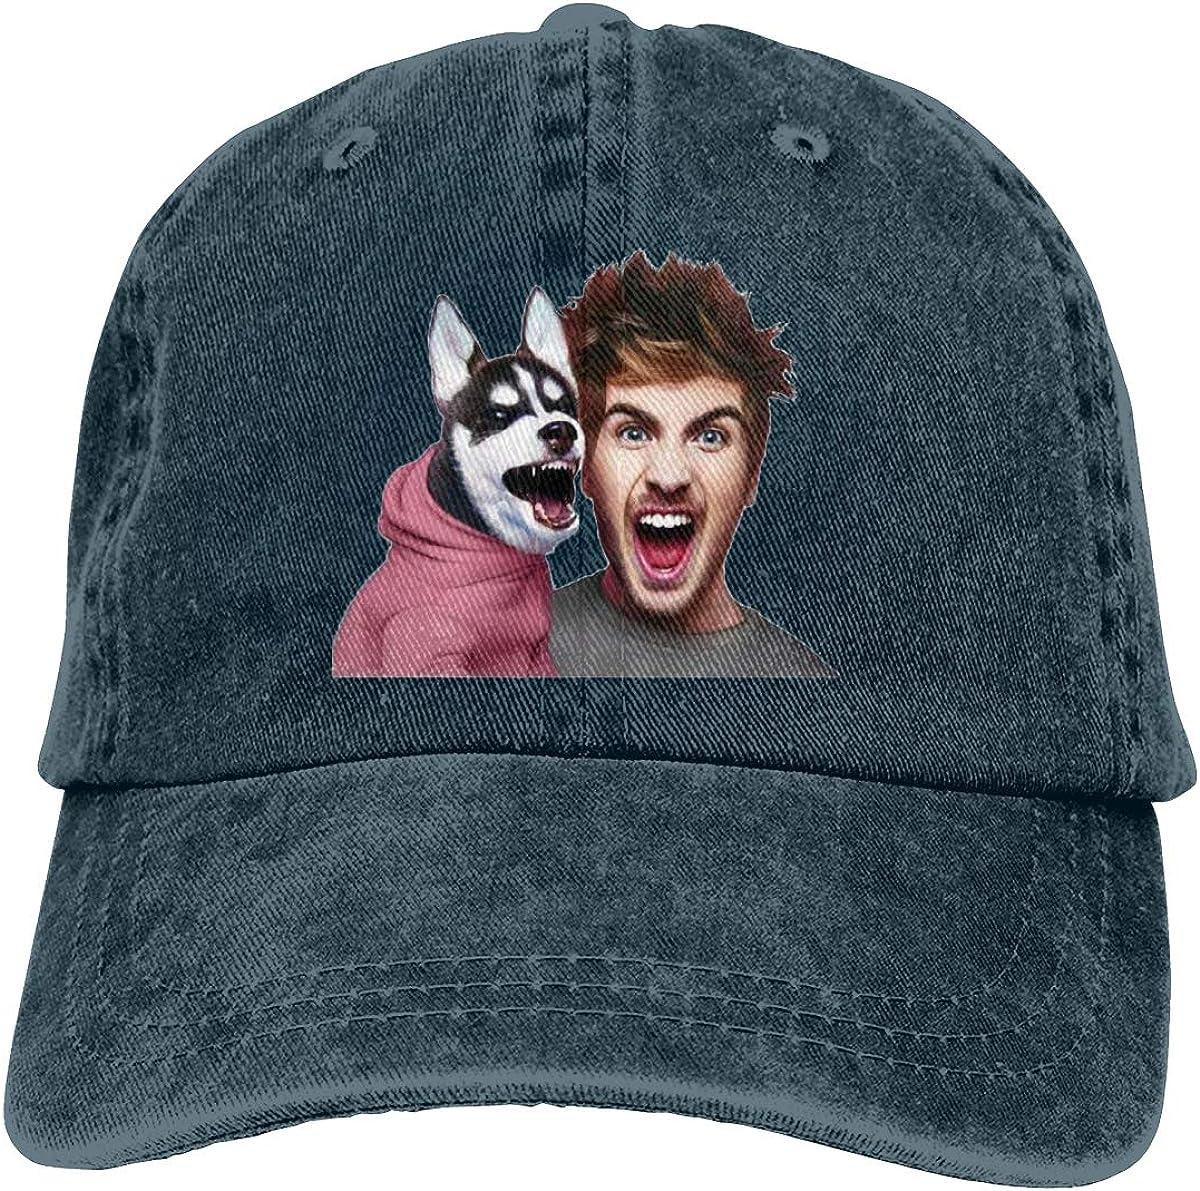 Zlizhi Joey Graceffa Men Women Plain Cotton Adjustable Washed Twill Low Profile Baseball Cap Hat